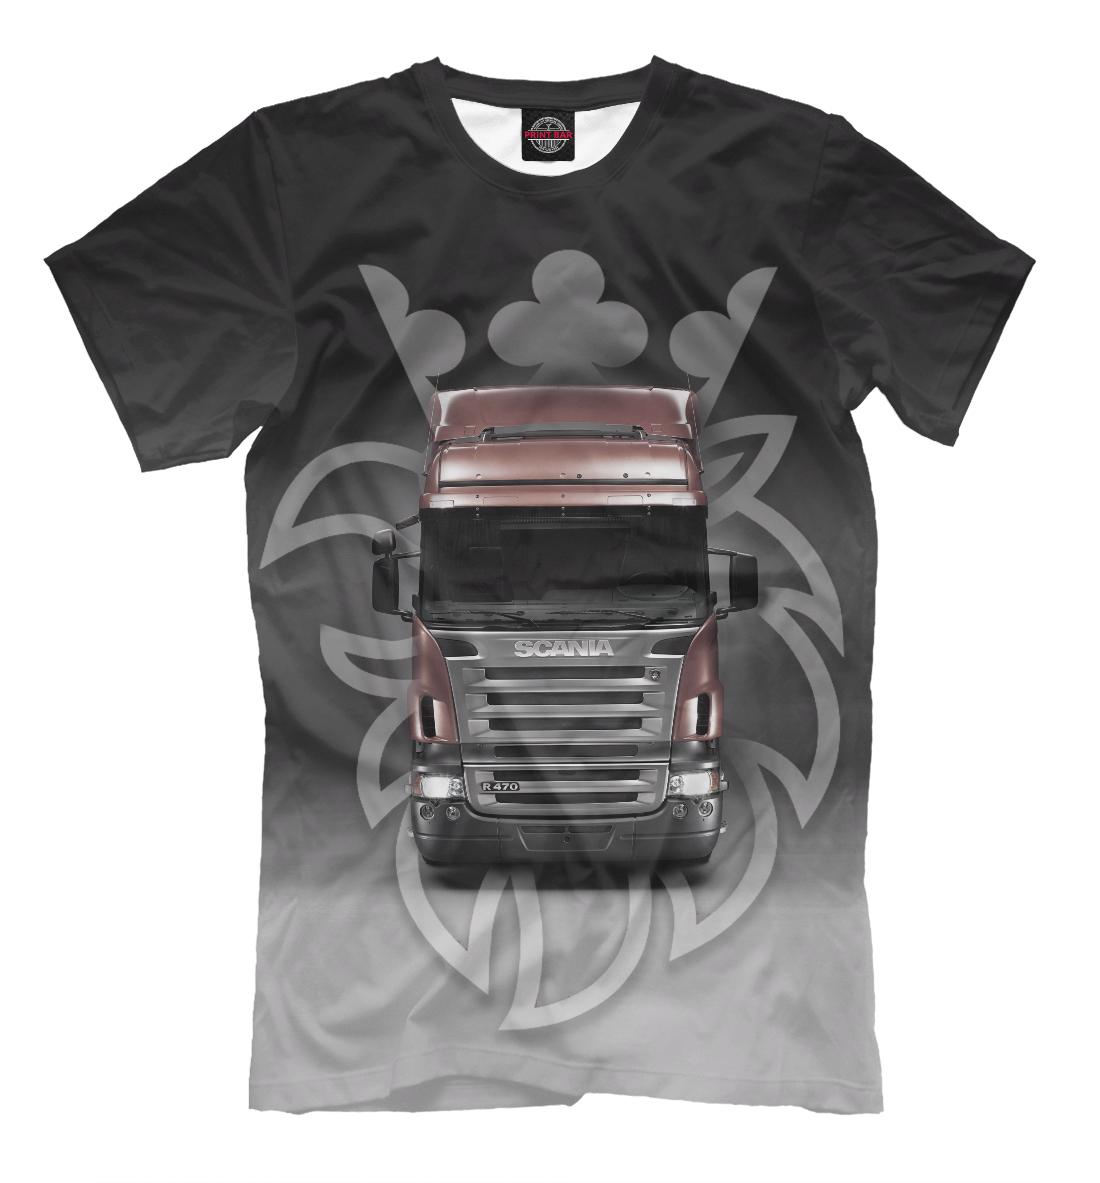 Купить Scania, Printbar, Футболки, GRZ-419575-fut-2